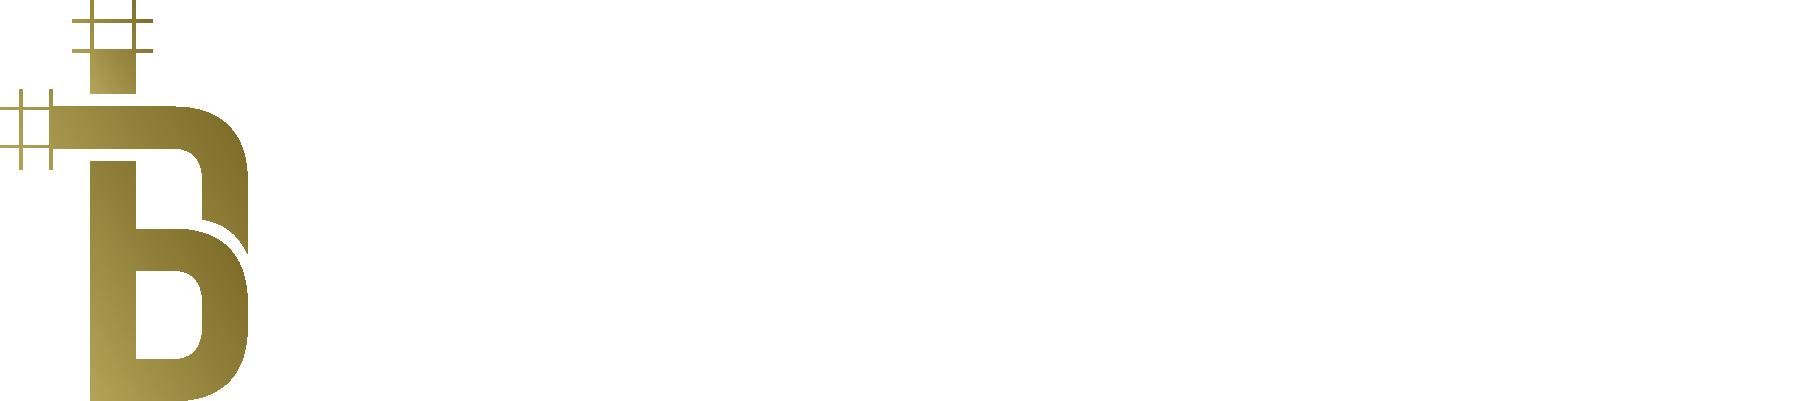 Buildingdetaillogo4Bhorizontalgw.png